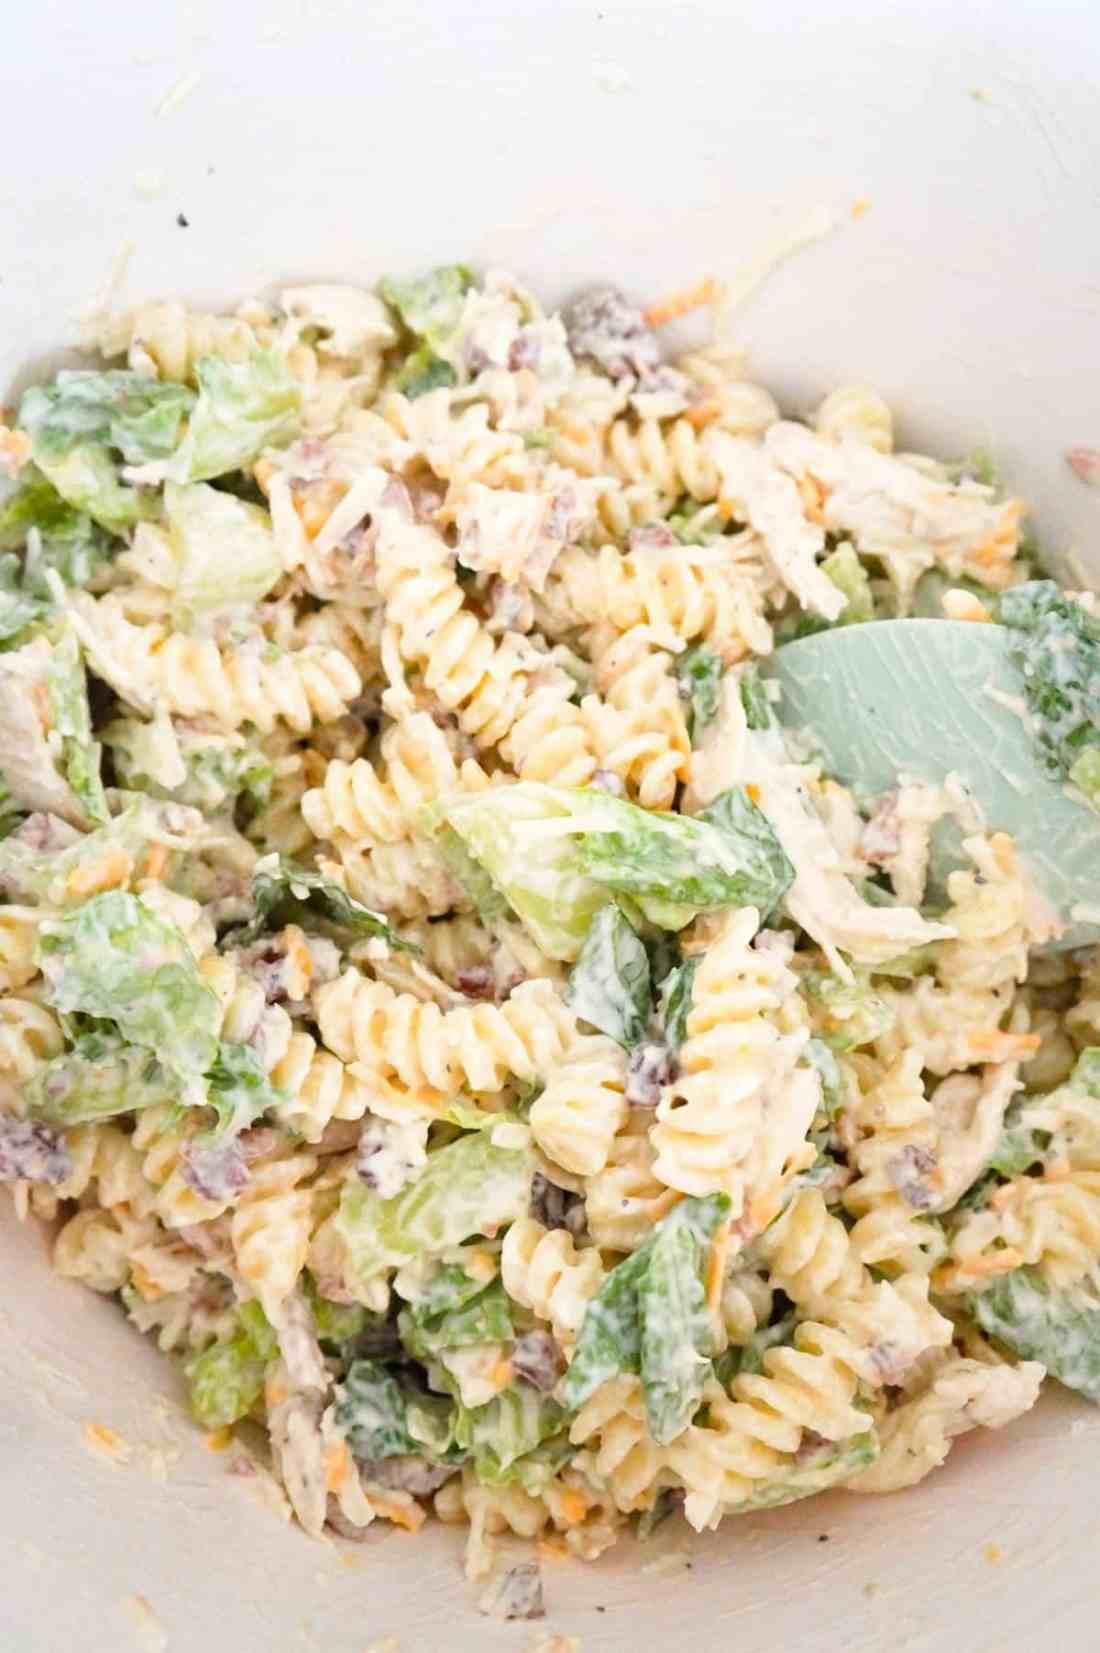 chicken caesar pasta salad mixture in a mixing bowl